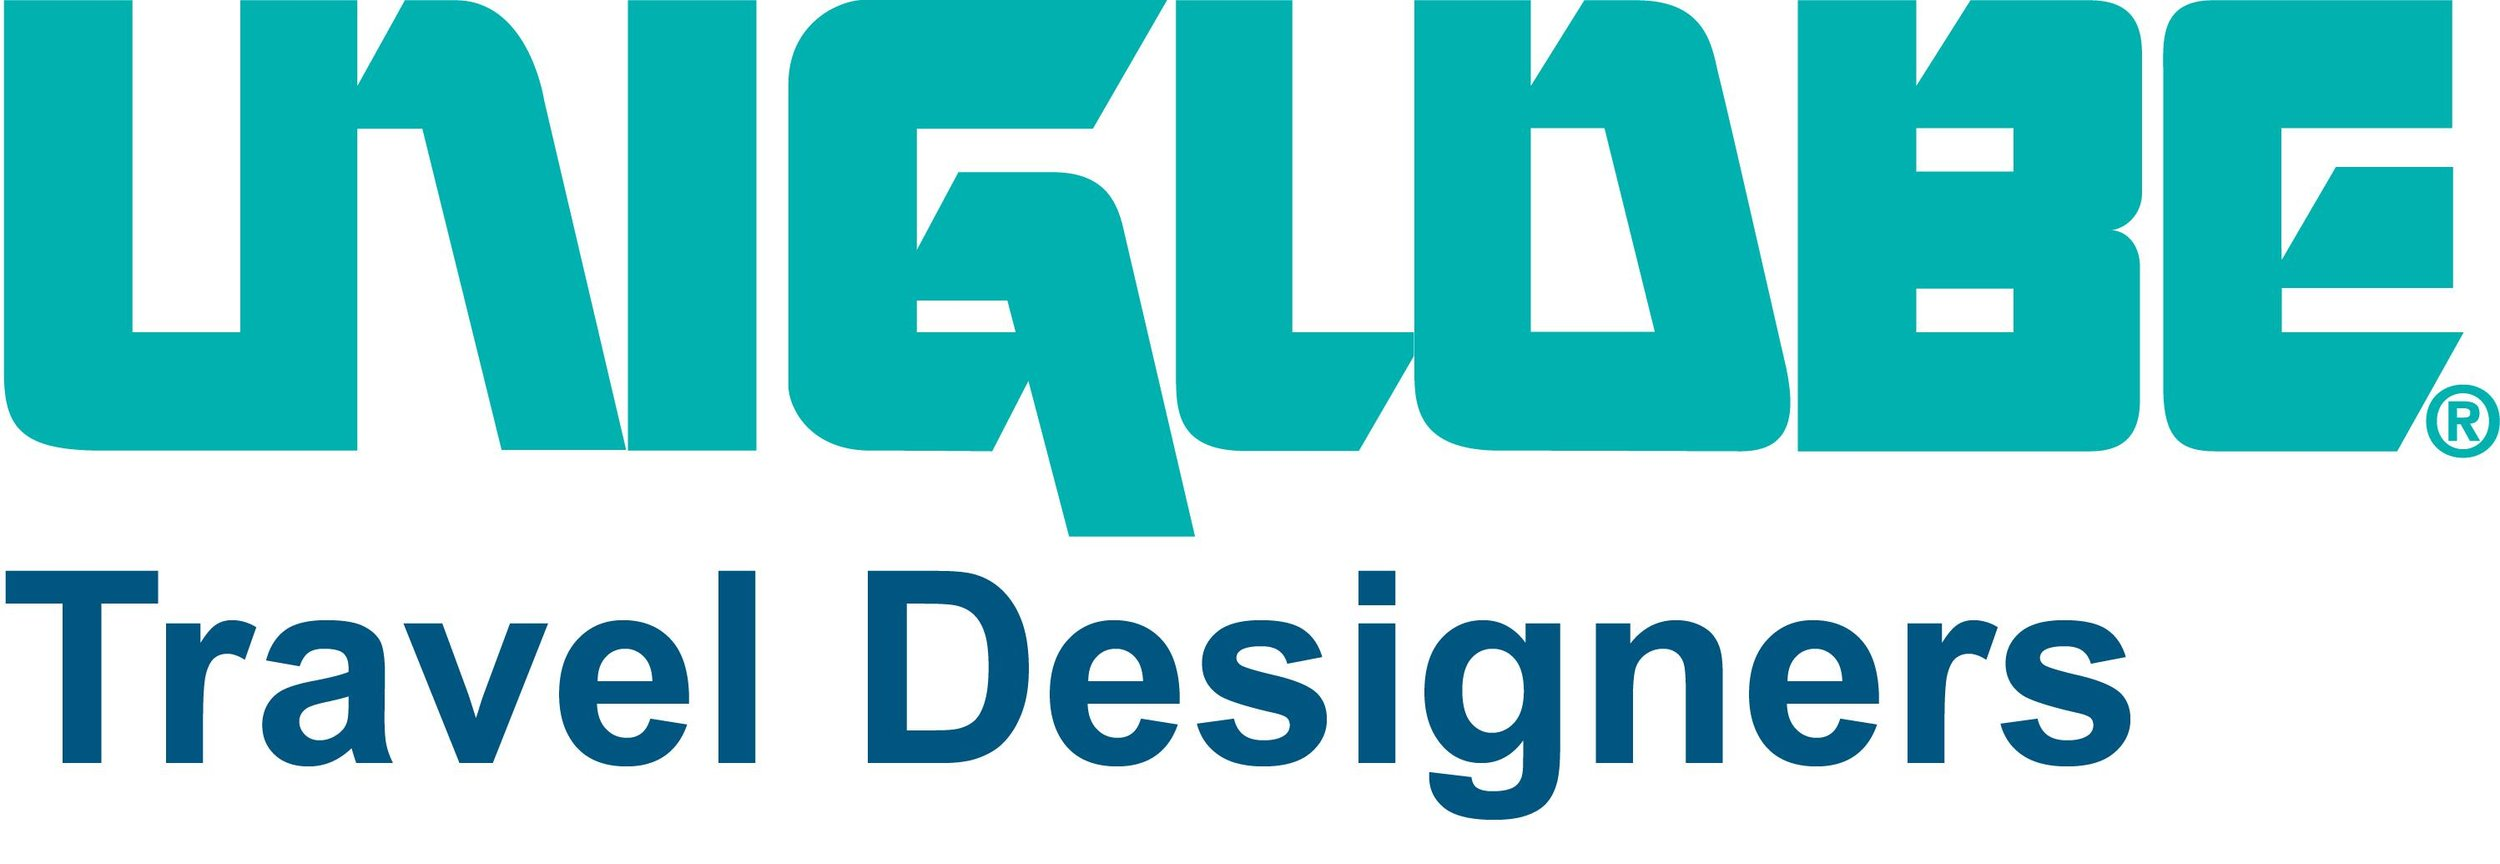 UNIGLOBE Travel Designers Logo HighRes.jpg